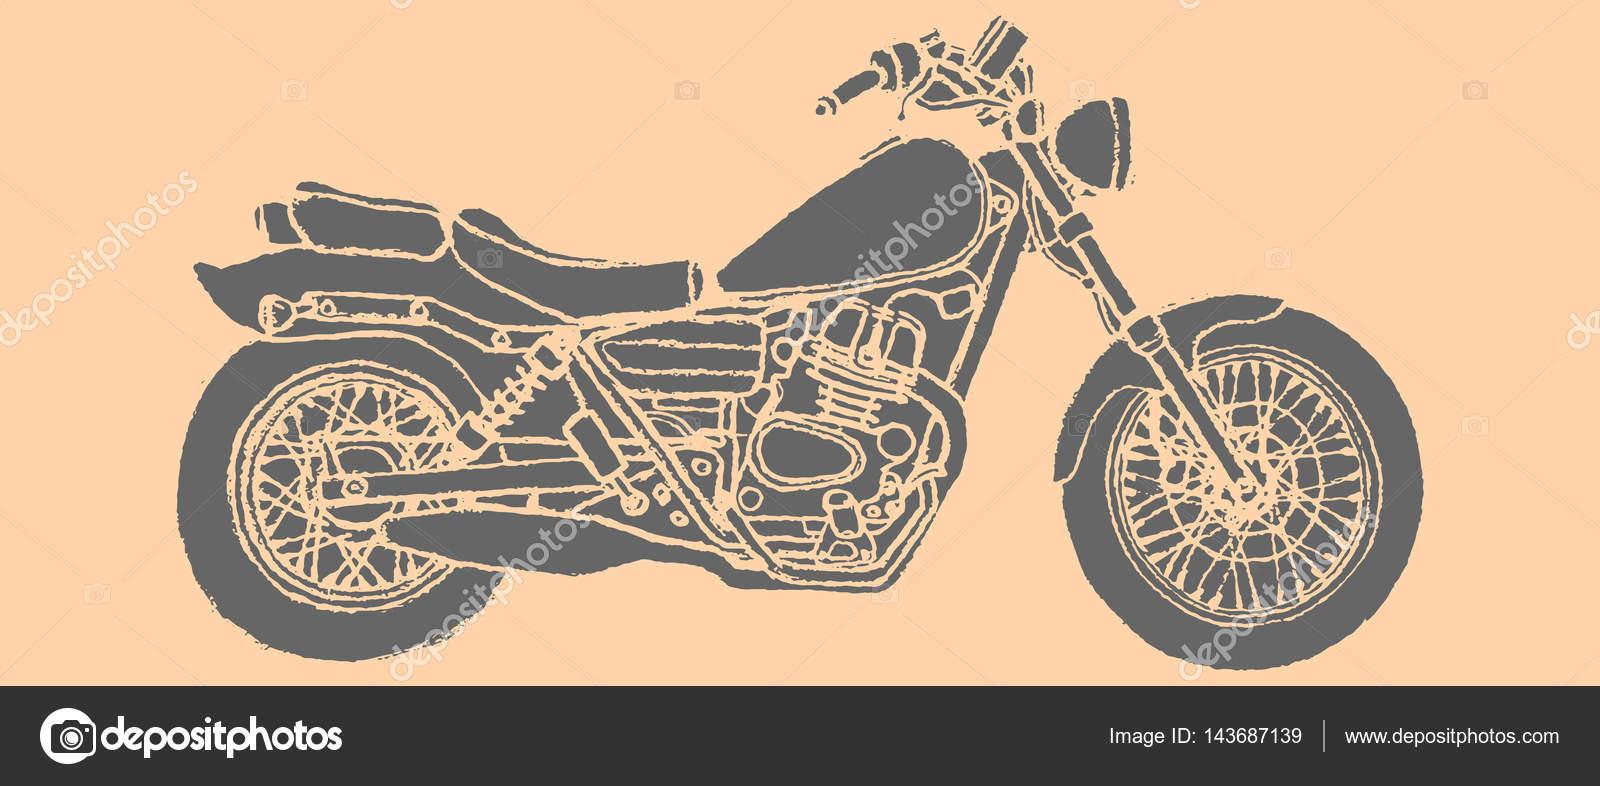 Imágenes Moto Para Dibujar Vista Lateral De Motos Dibujo Mano